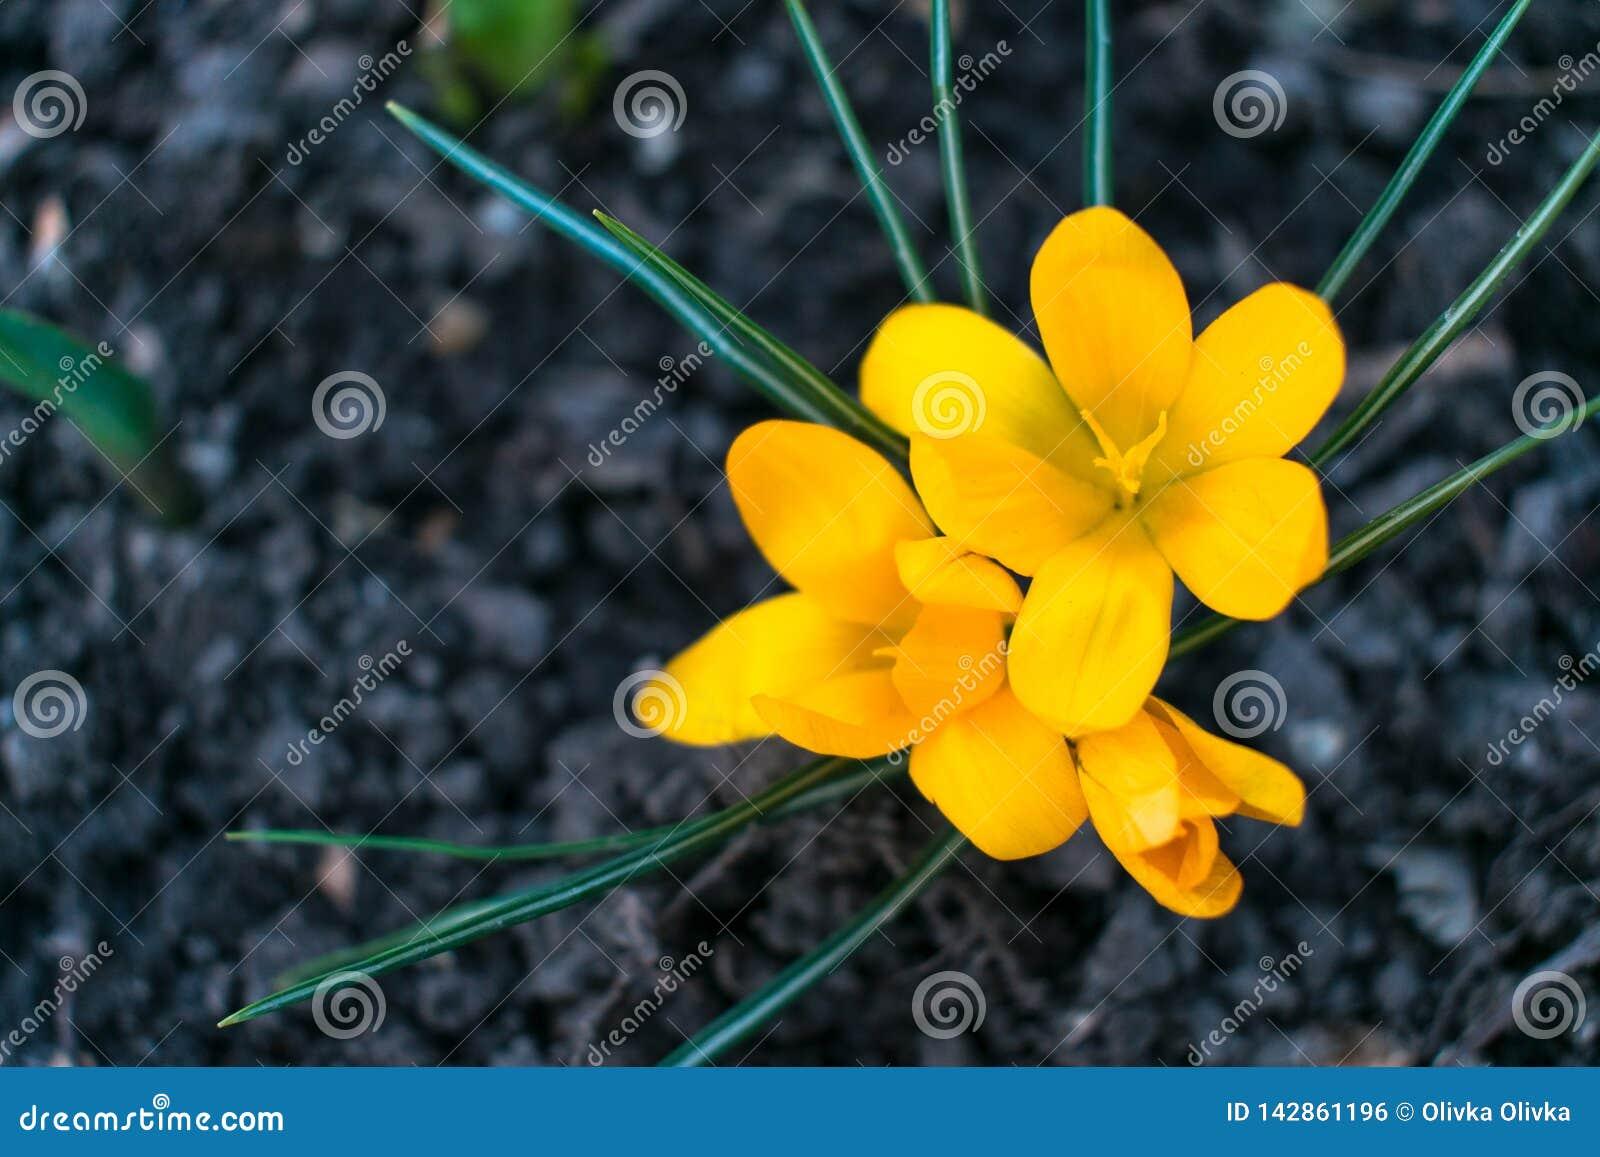 Yellow Crocus Flower